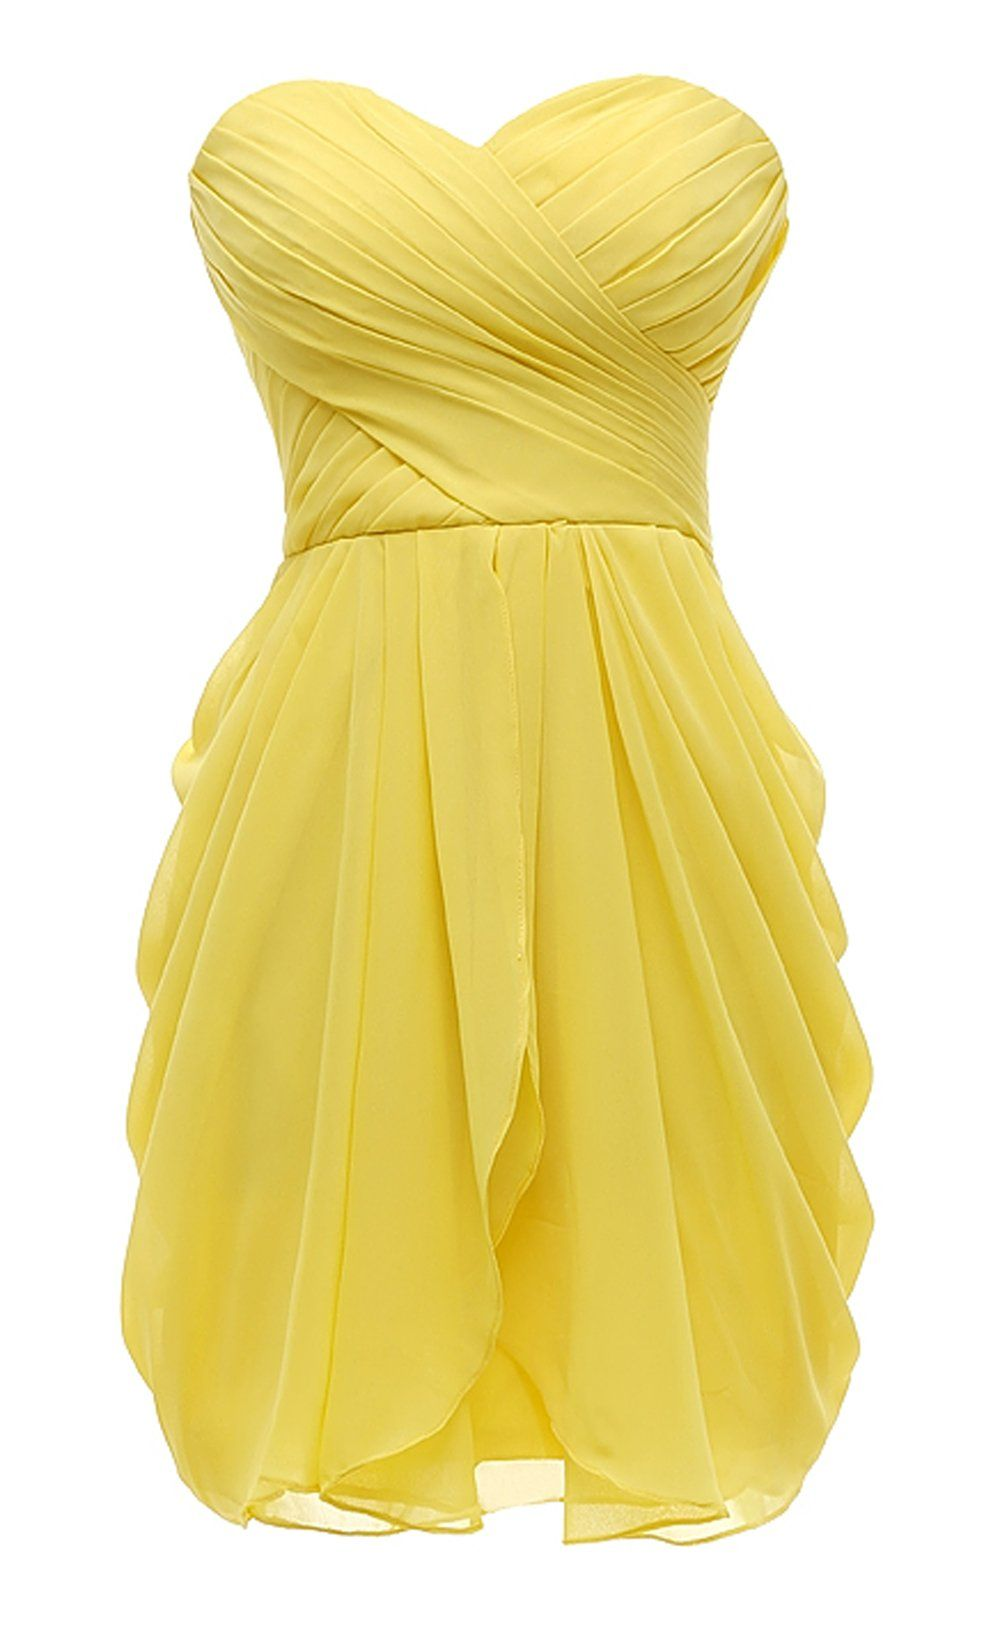 Kiss Dress Short Strapless Prom Dress Soft Chiffon Evening Dress Amazon Com Yellow Bridesmaid Dresses Short Strapless Prom Dresses Short Bridesmaid Dresses [ 1635 x 1000 Pixel ]